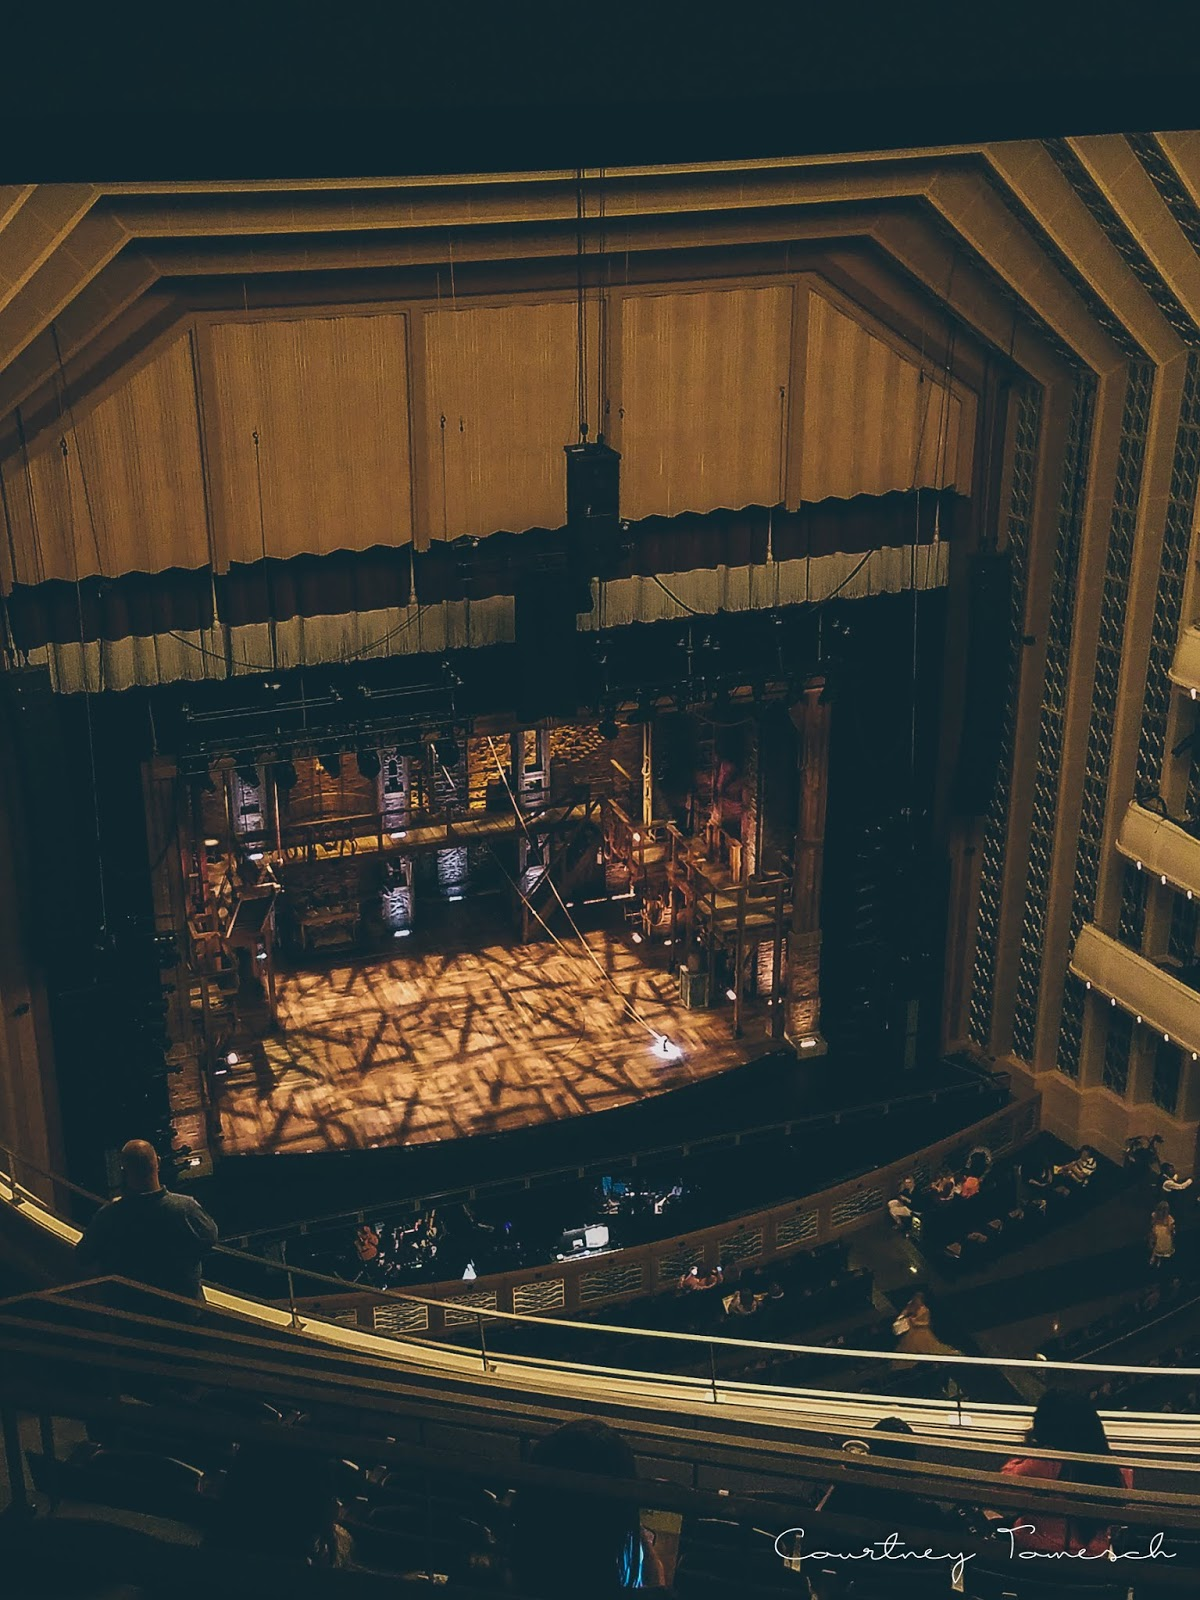 Courtney Tomesch Las Vegas Hamilton Musical Pinball Hall of Fame